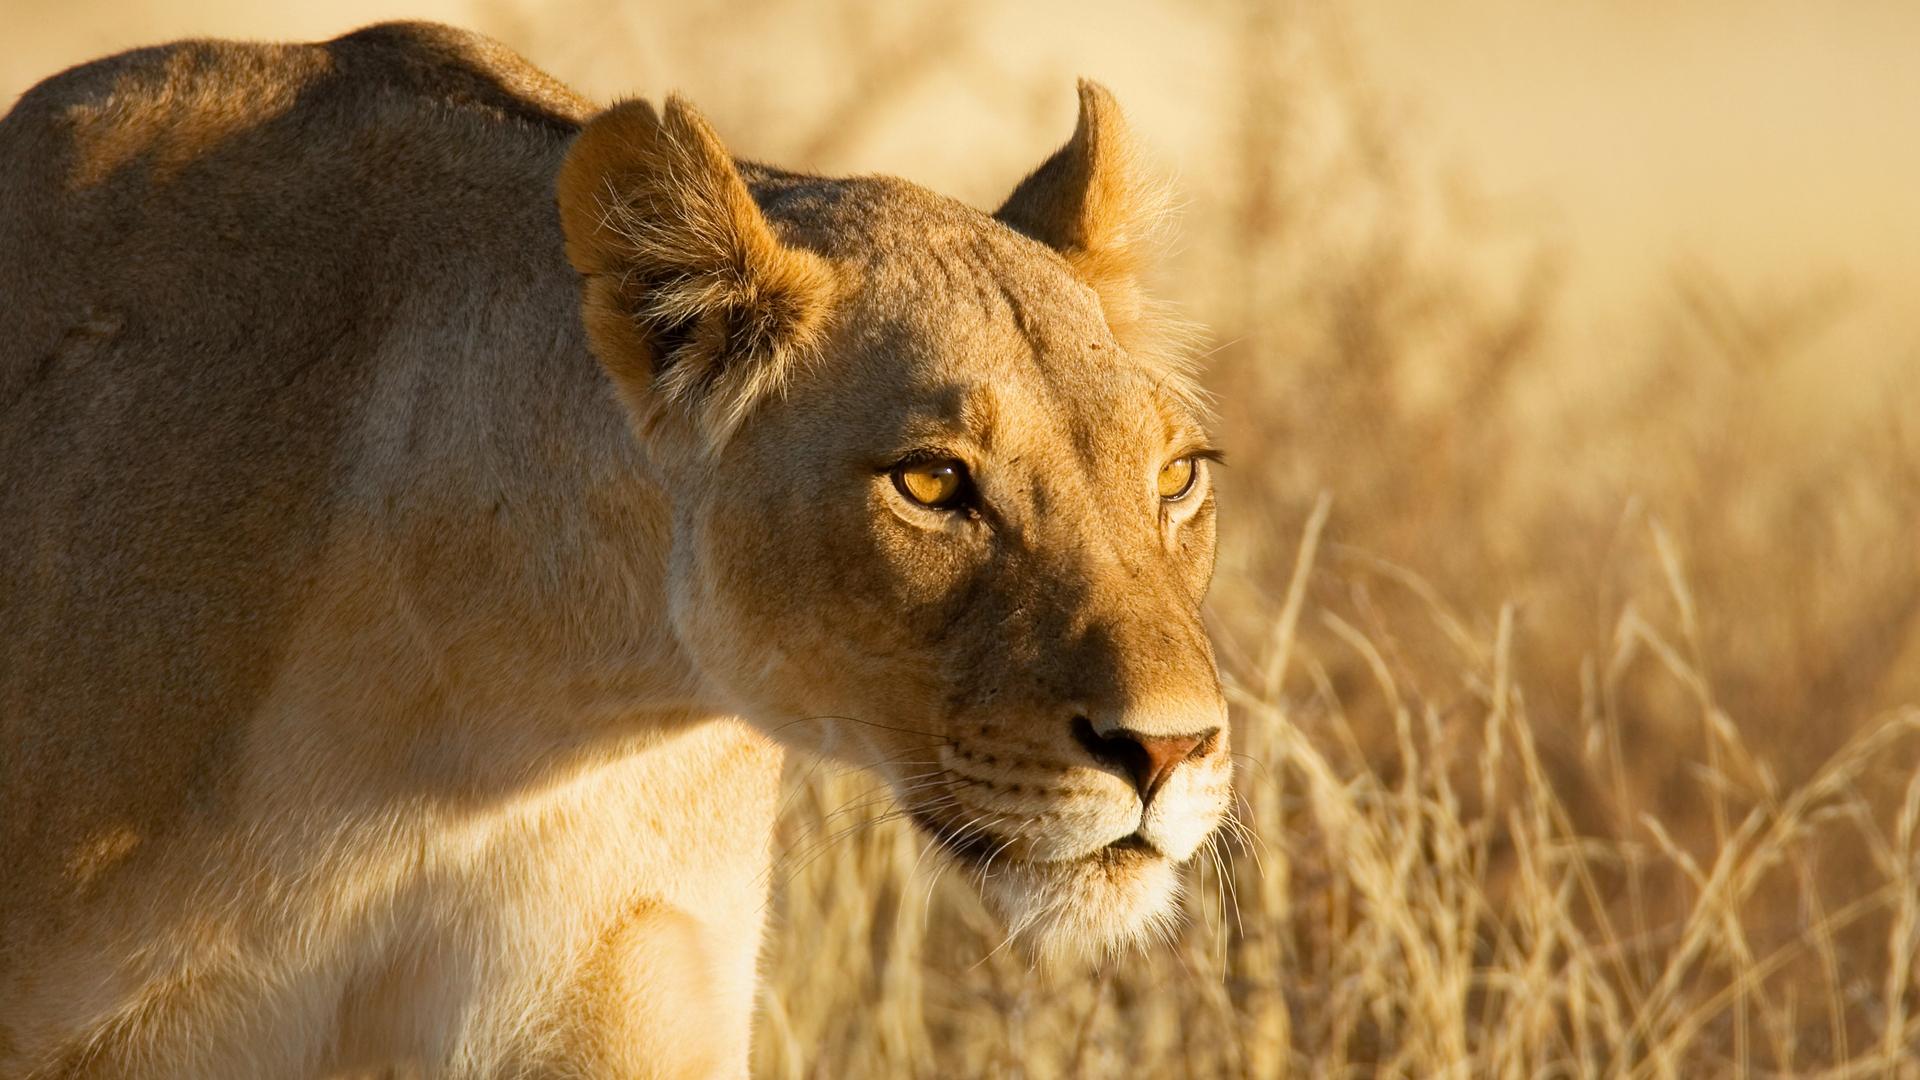 Wallpaper Lion Lioness Grass Hunting 1920x1080 659687 Hd